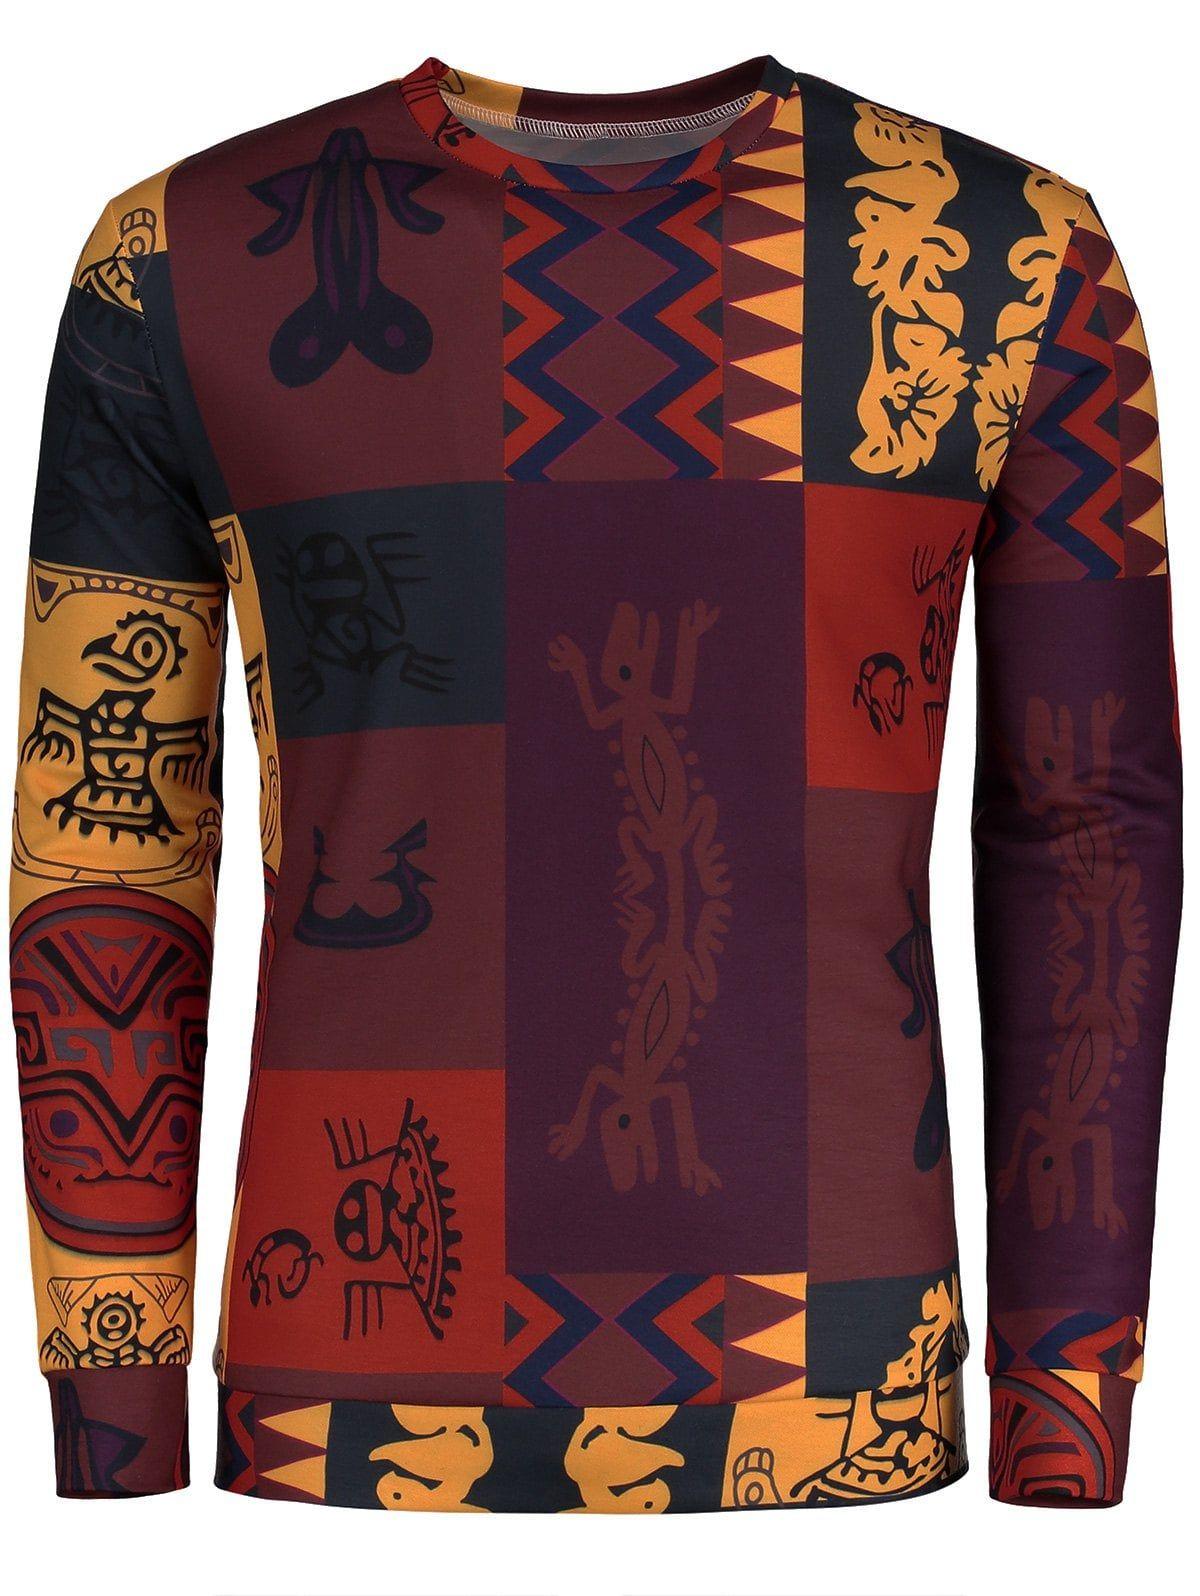 Ethnic Fashionable T Shirt,for Men,S